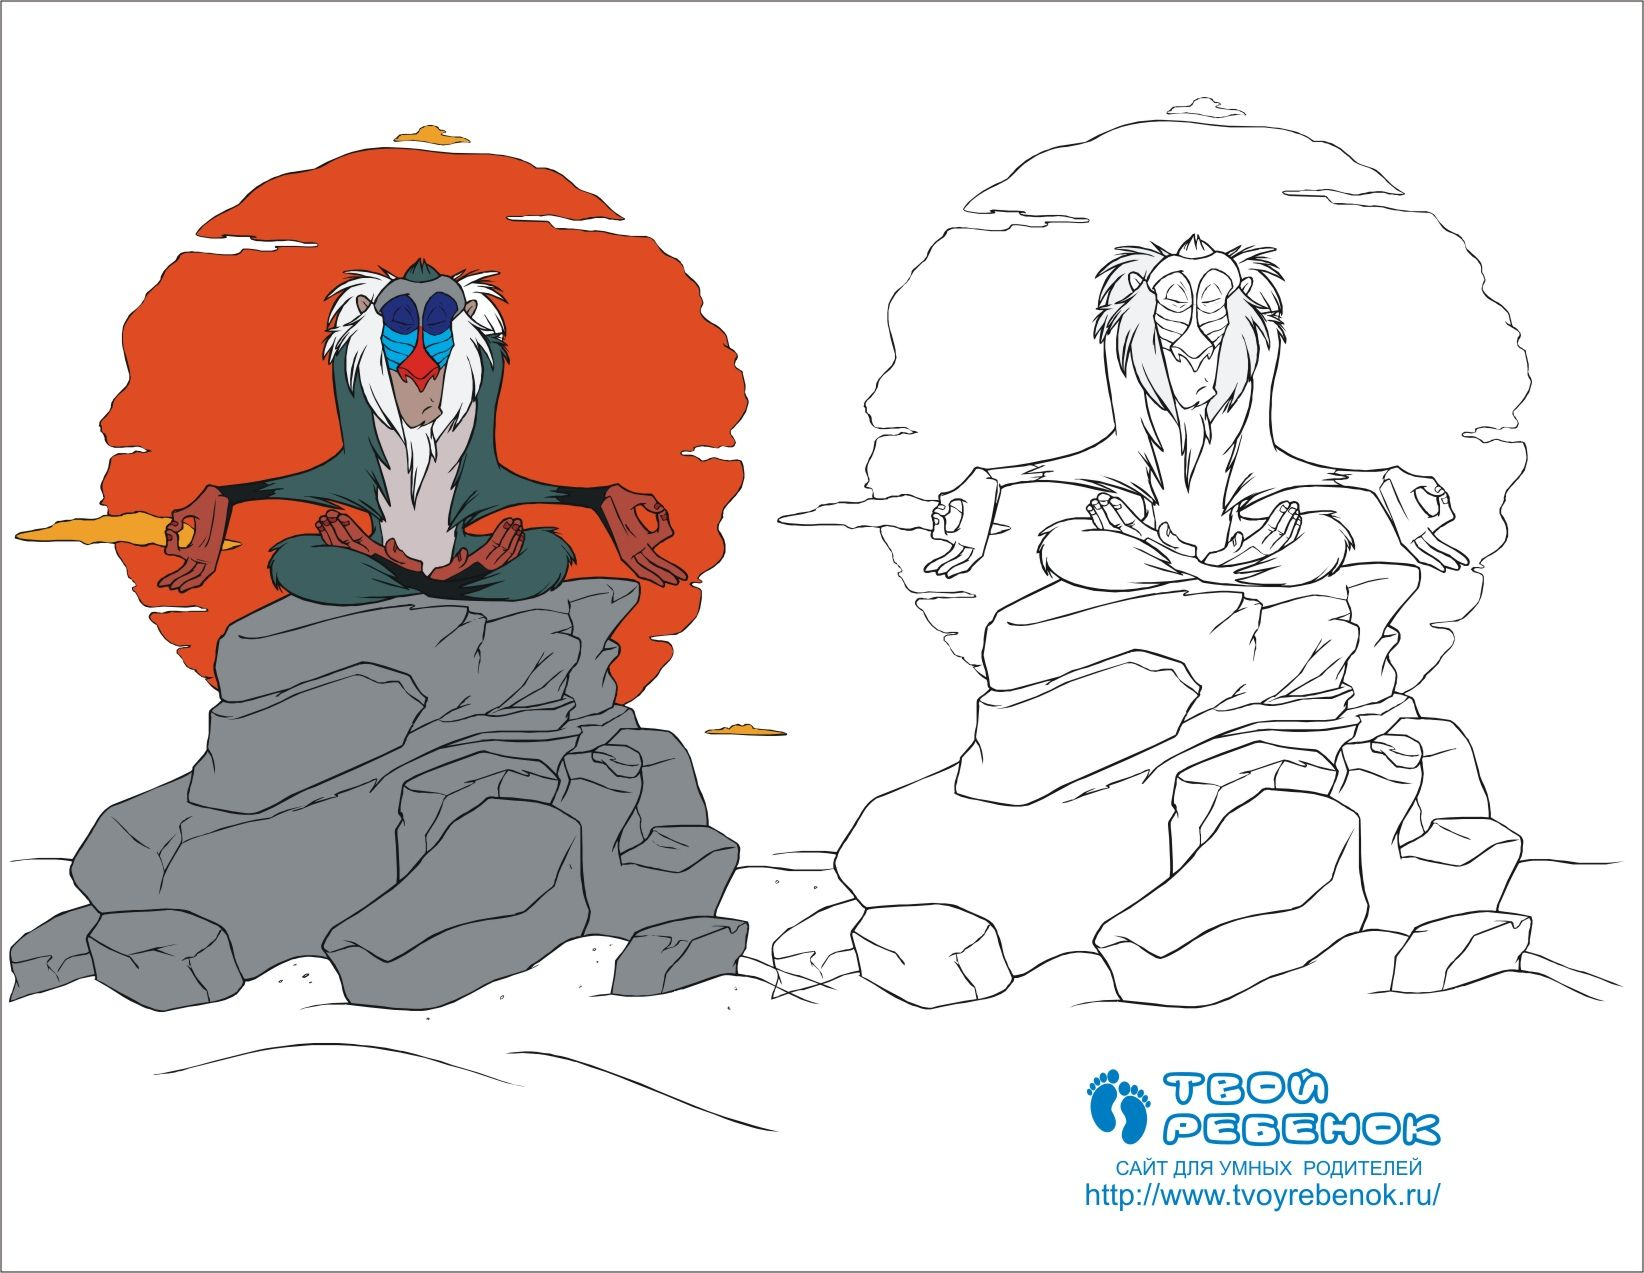 Раскраска обезьяна м/ф Король Лев   Король лев, Раскраски ...